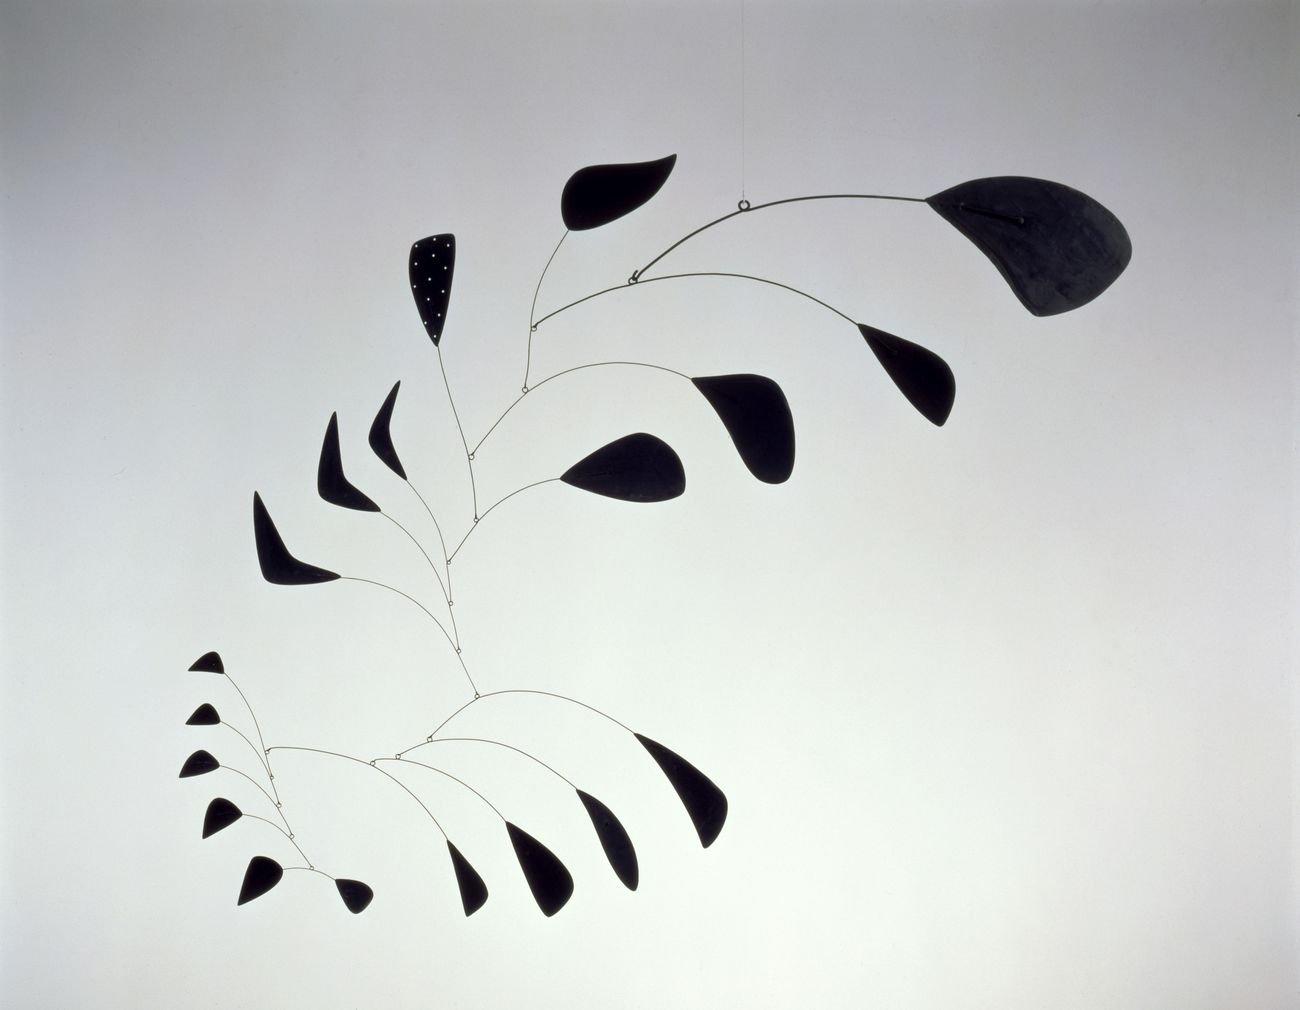 "Alexander Calder, Vertical Foliage, 1941, sheet metal, wire, and paint, 53 1/2"" x 66"", Calder Foundation, New York © 2019 Calder Foundation, New York / ADAGP, Paris"